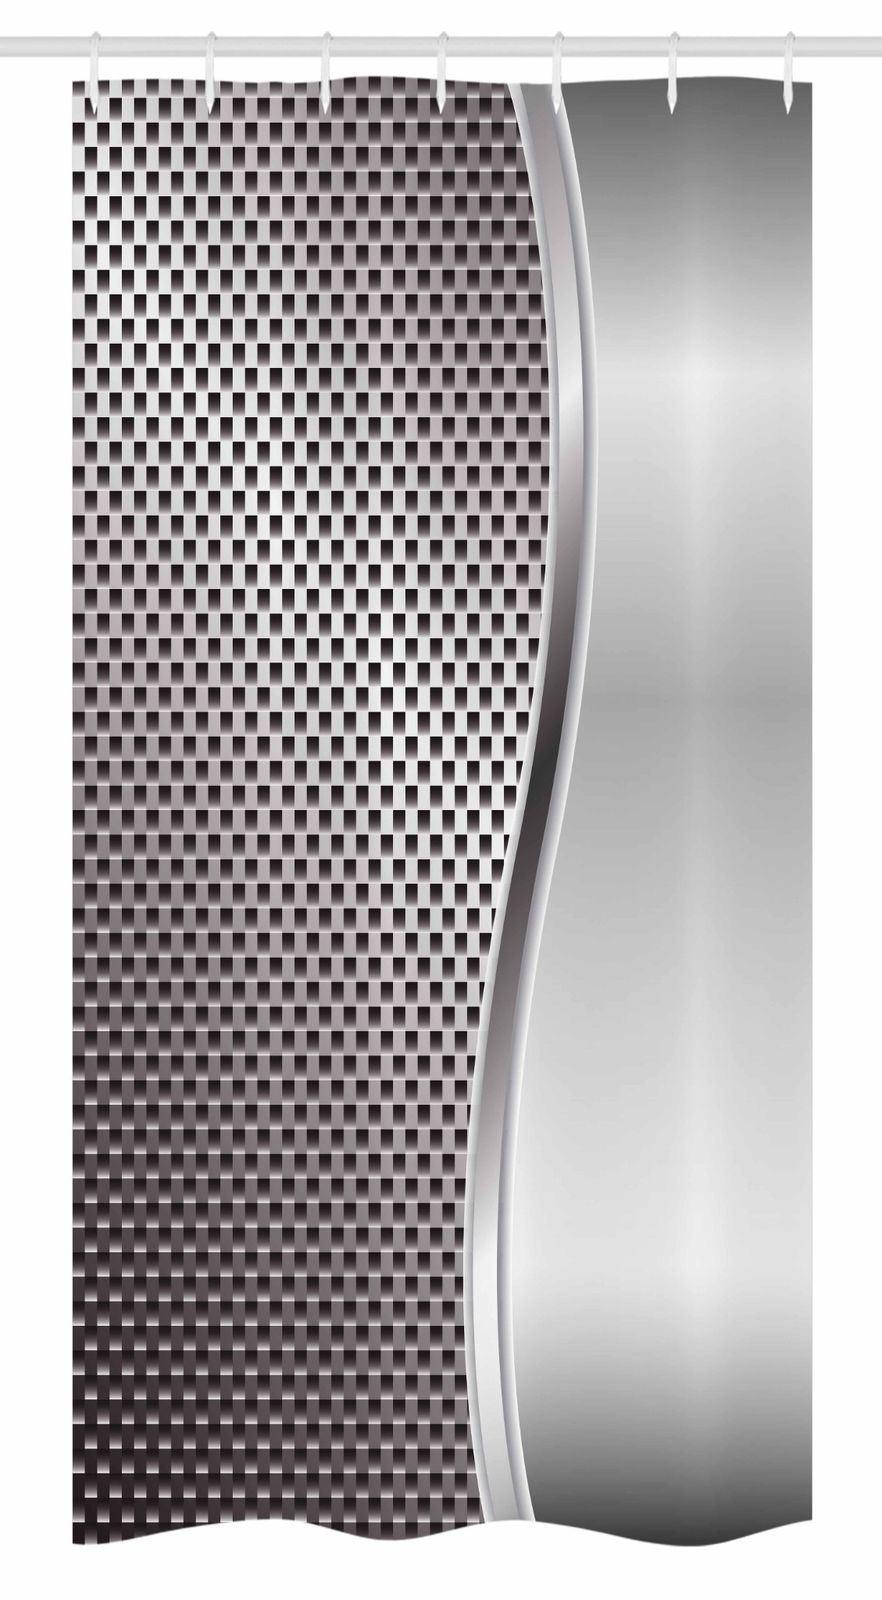 Metal Sheet Stall Shower Curtain Modern Silver Grid Squares Geometric Art 54x78 Shower Curtains